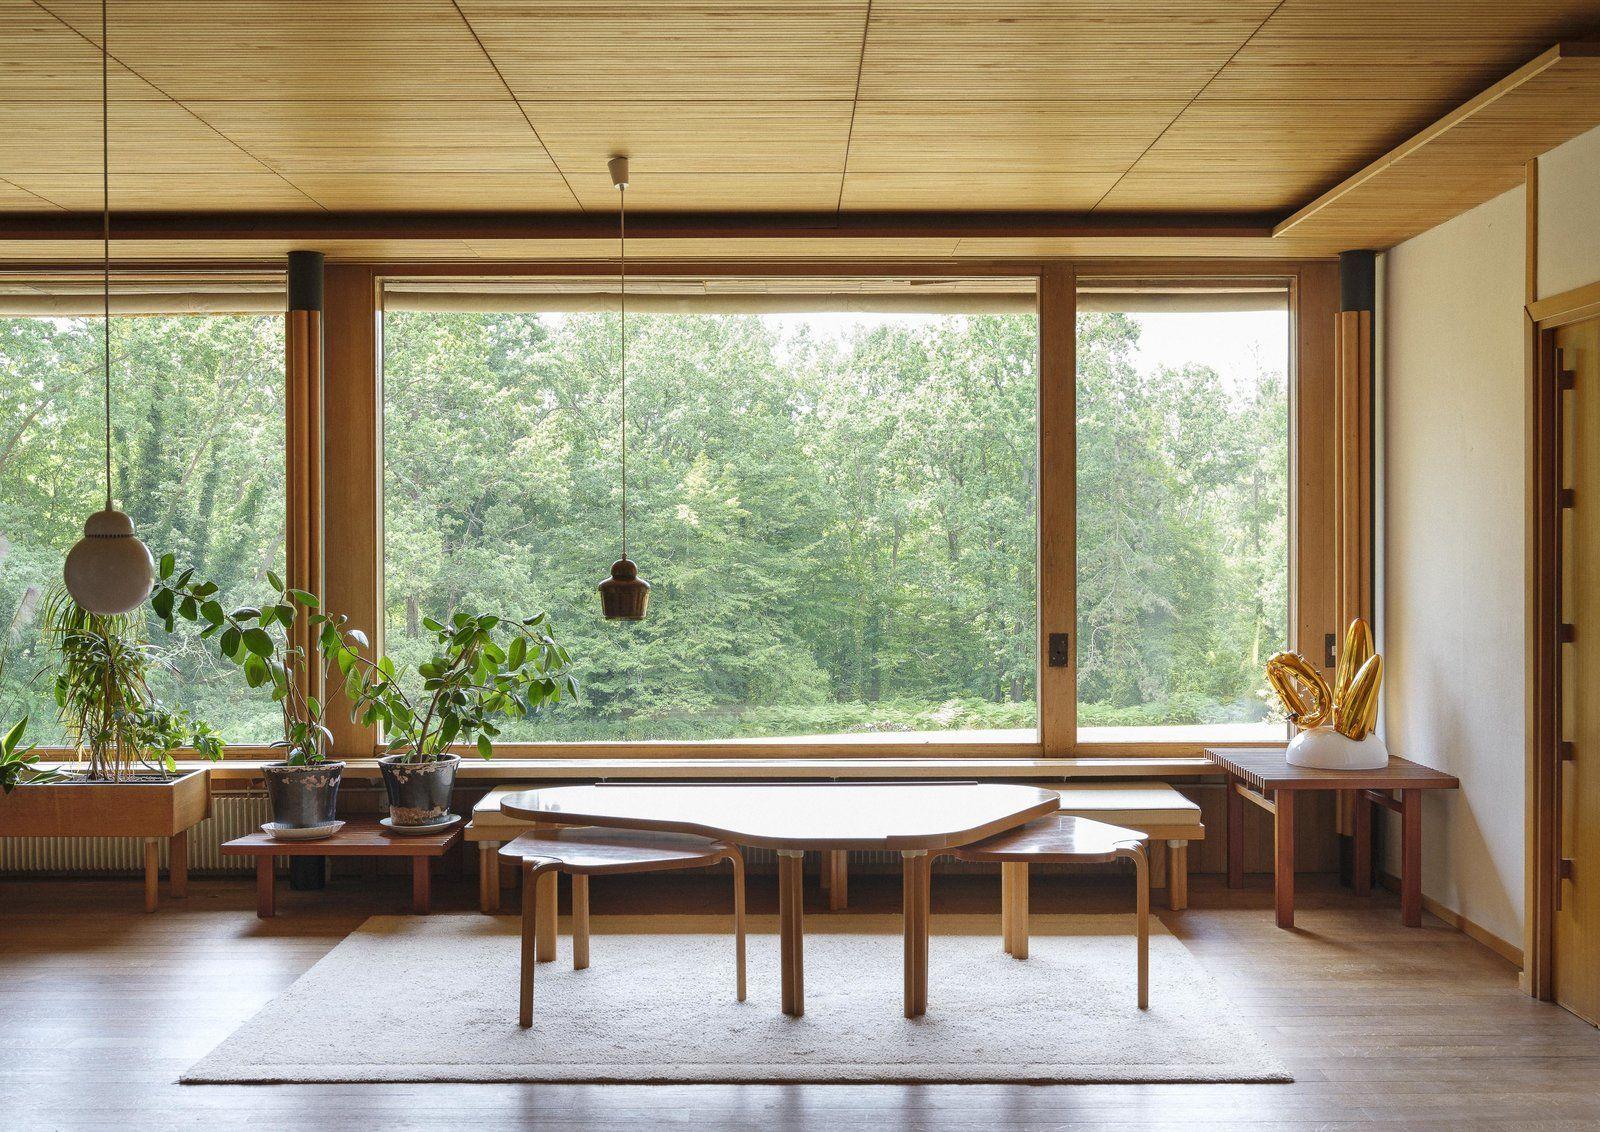 Maison Louis Carre By Alvar Aalto In 2020 Alvar Aalto Light Hardwood Floors Modernist Architects